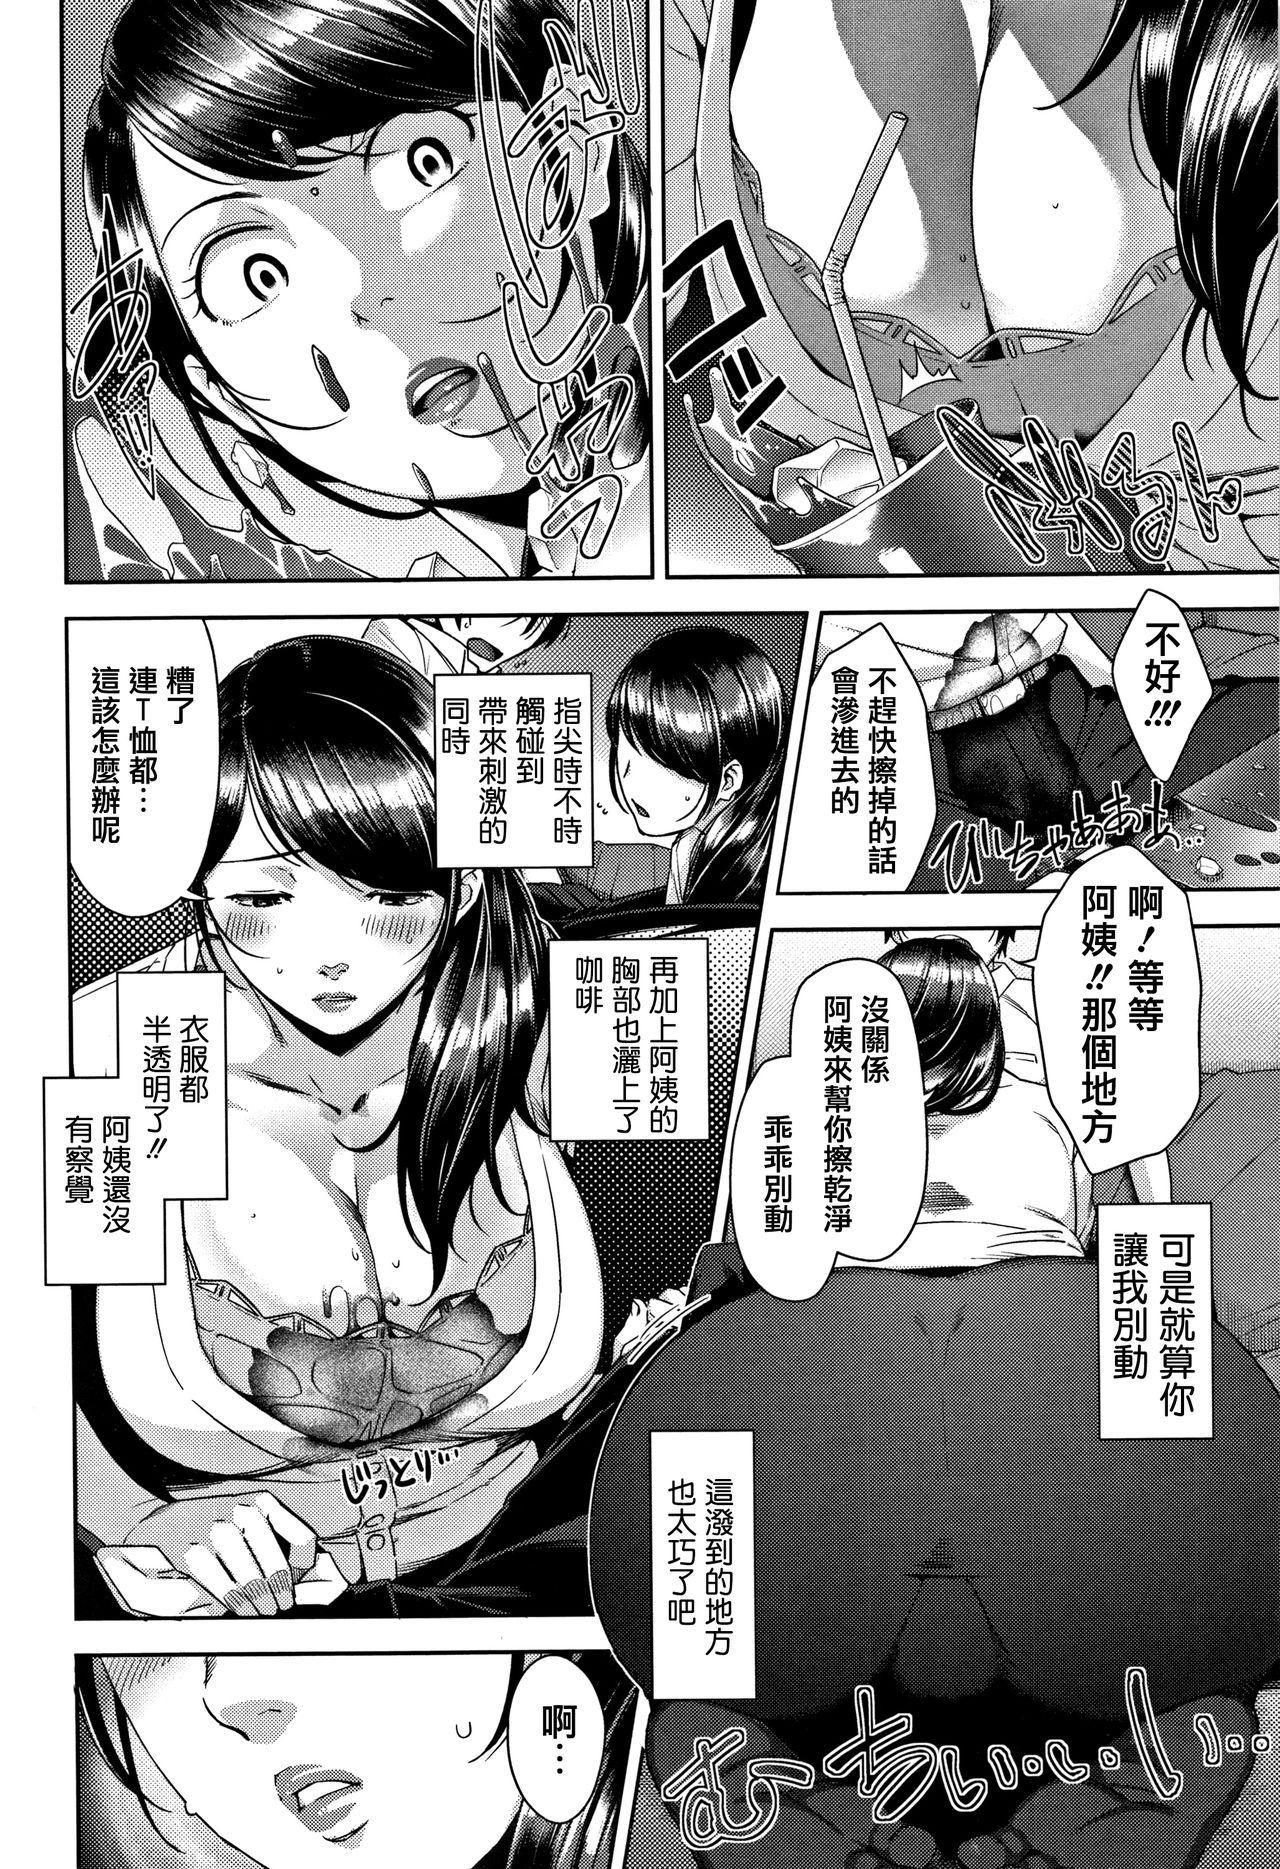 Kanjyuku Chijyo 15